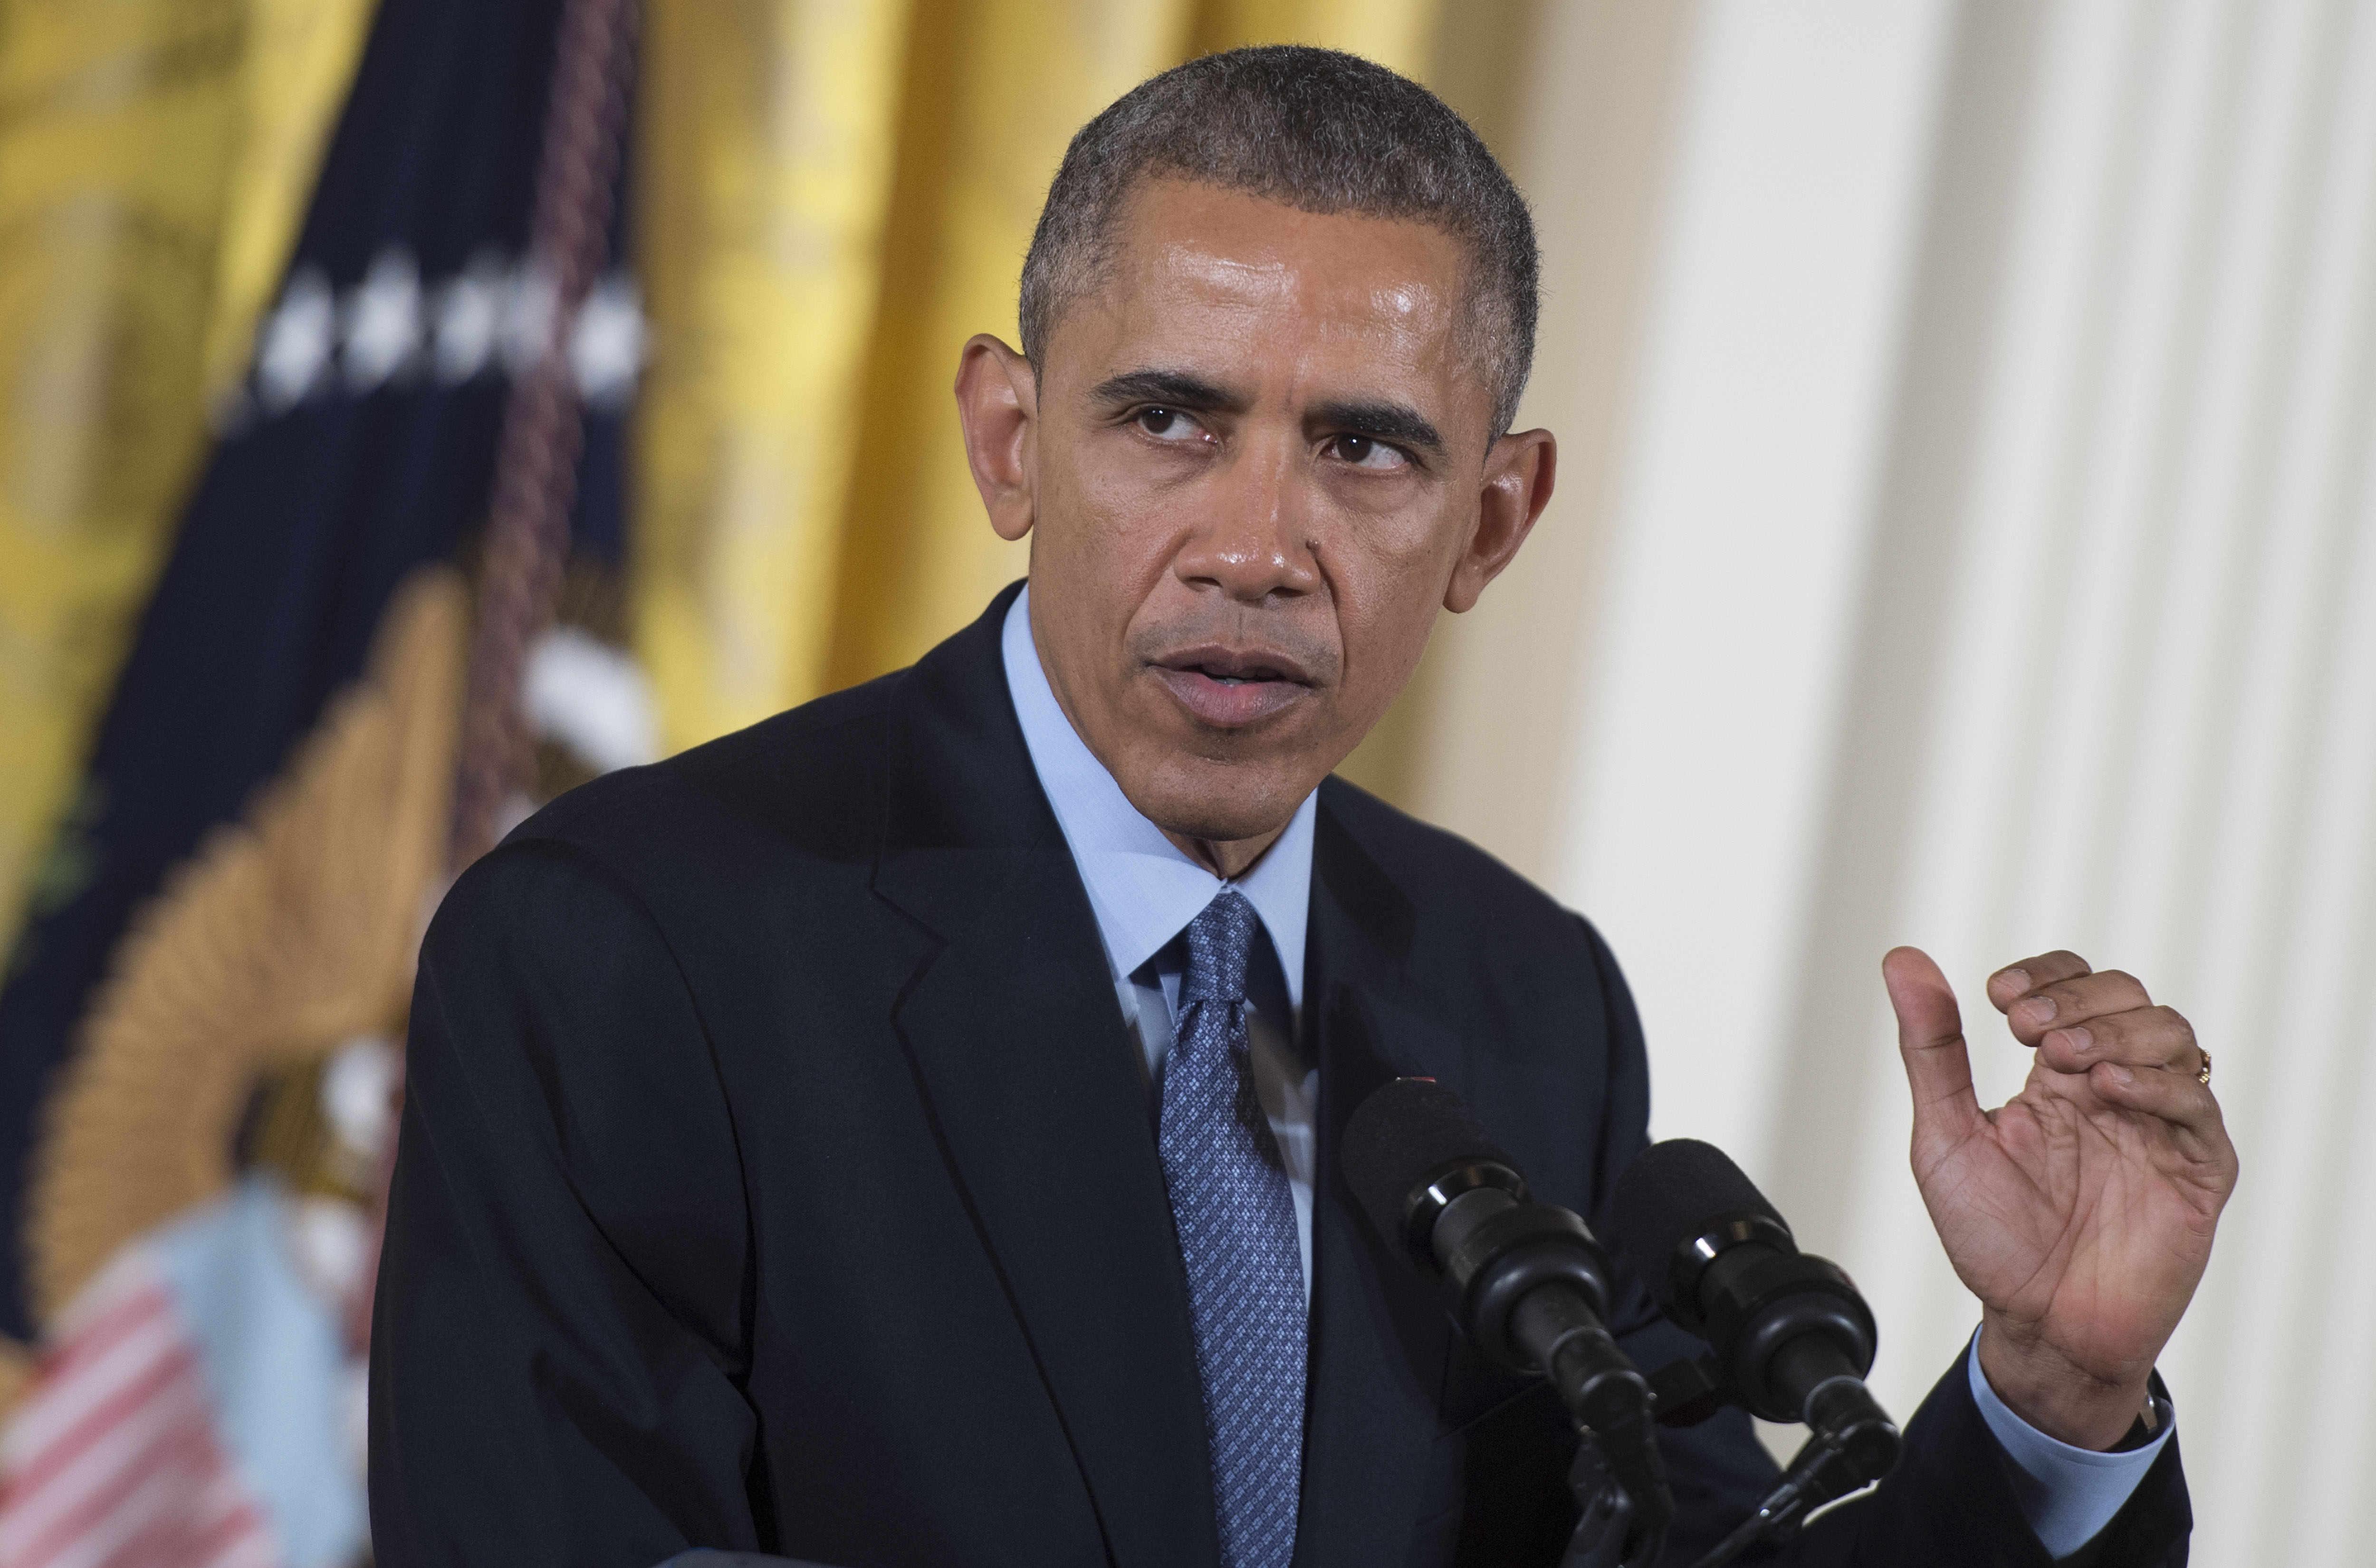 US President Barack Obama speaks at the White House in Washington, DC on February 12, 2015